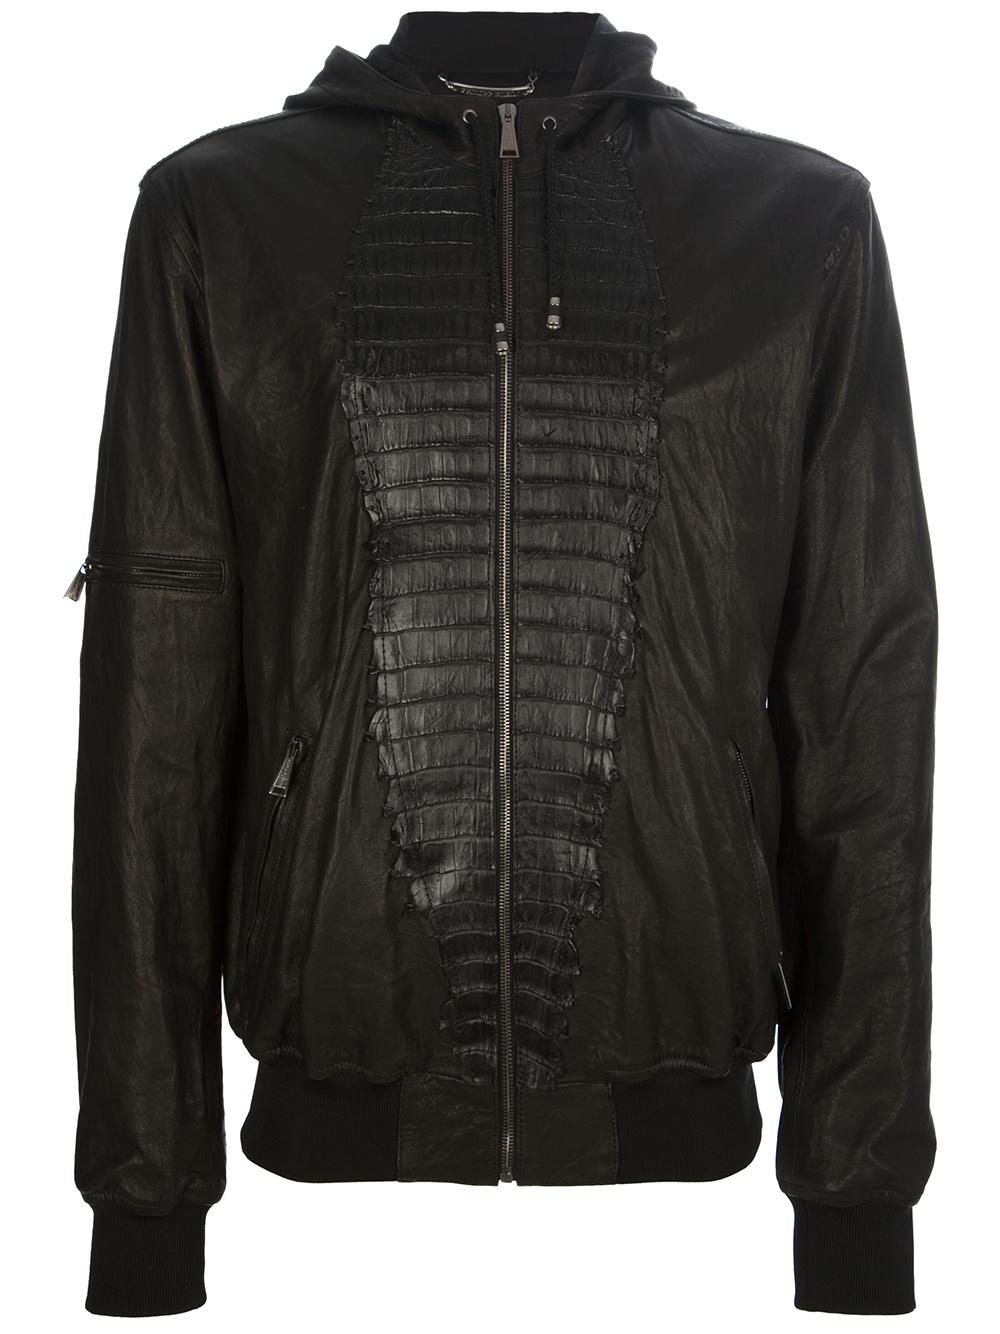 philipp plein skyline leather jacket in black for men lyst. Black Bedroom Furniture Sets. Home Design Ideas